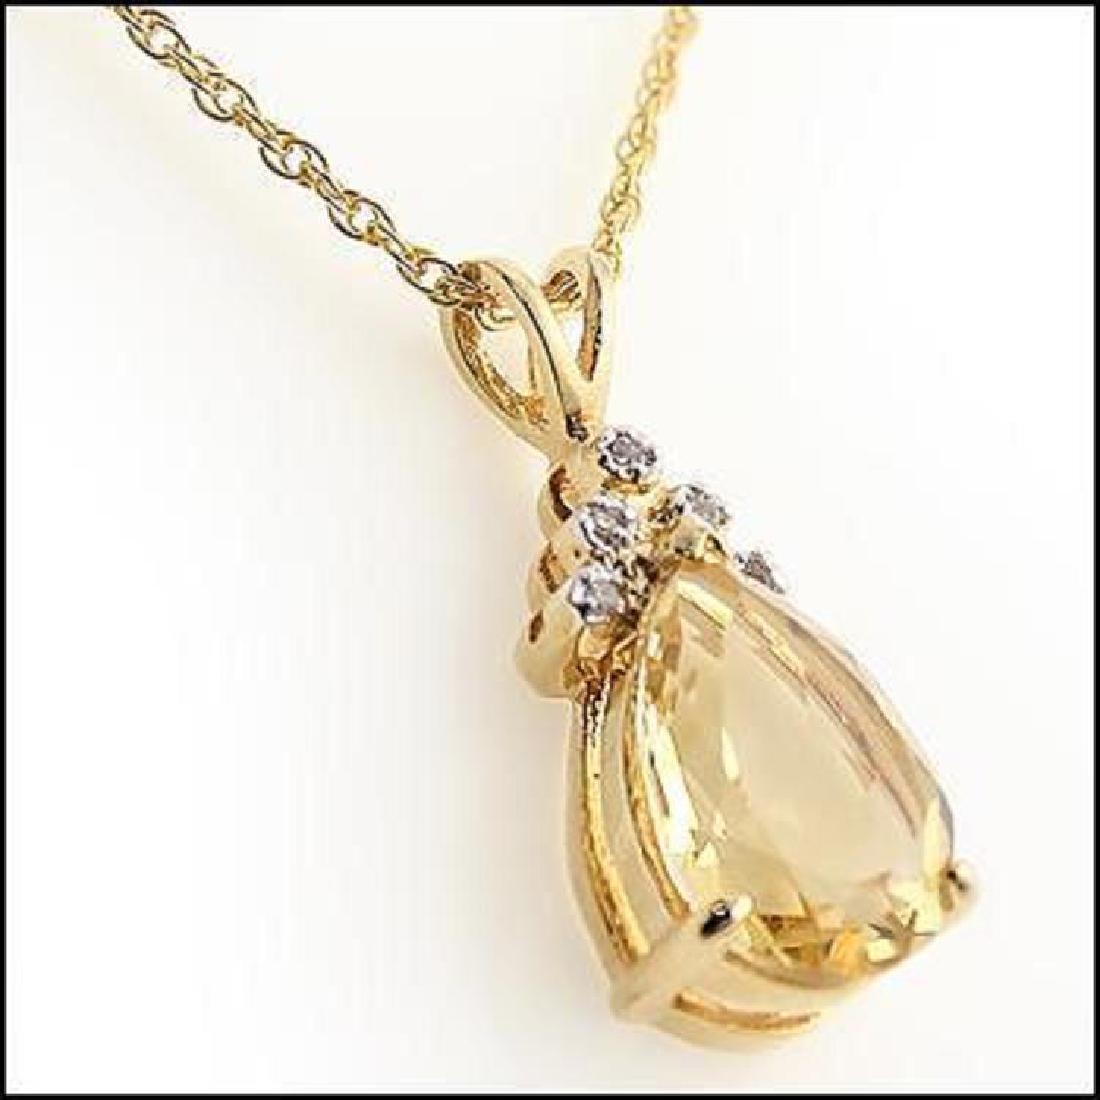 6 CT Citrine Diamond Pendant